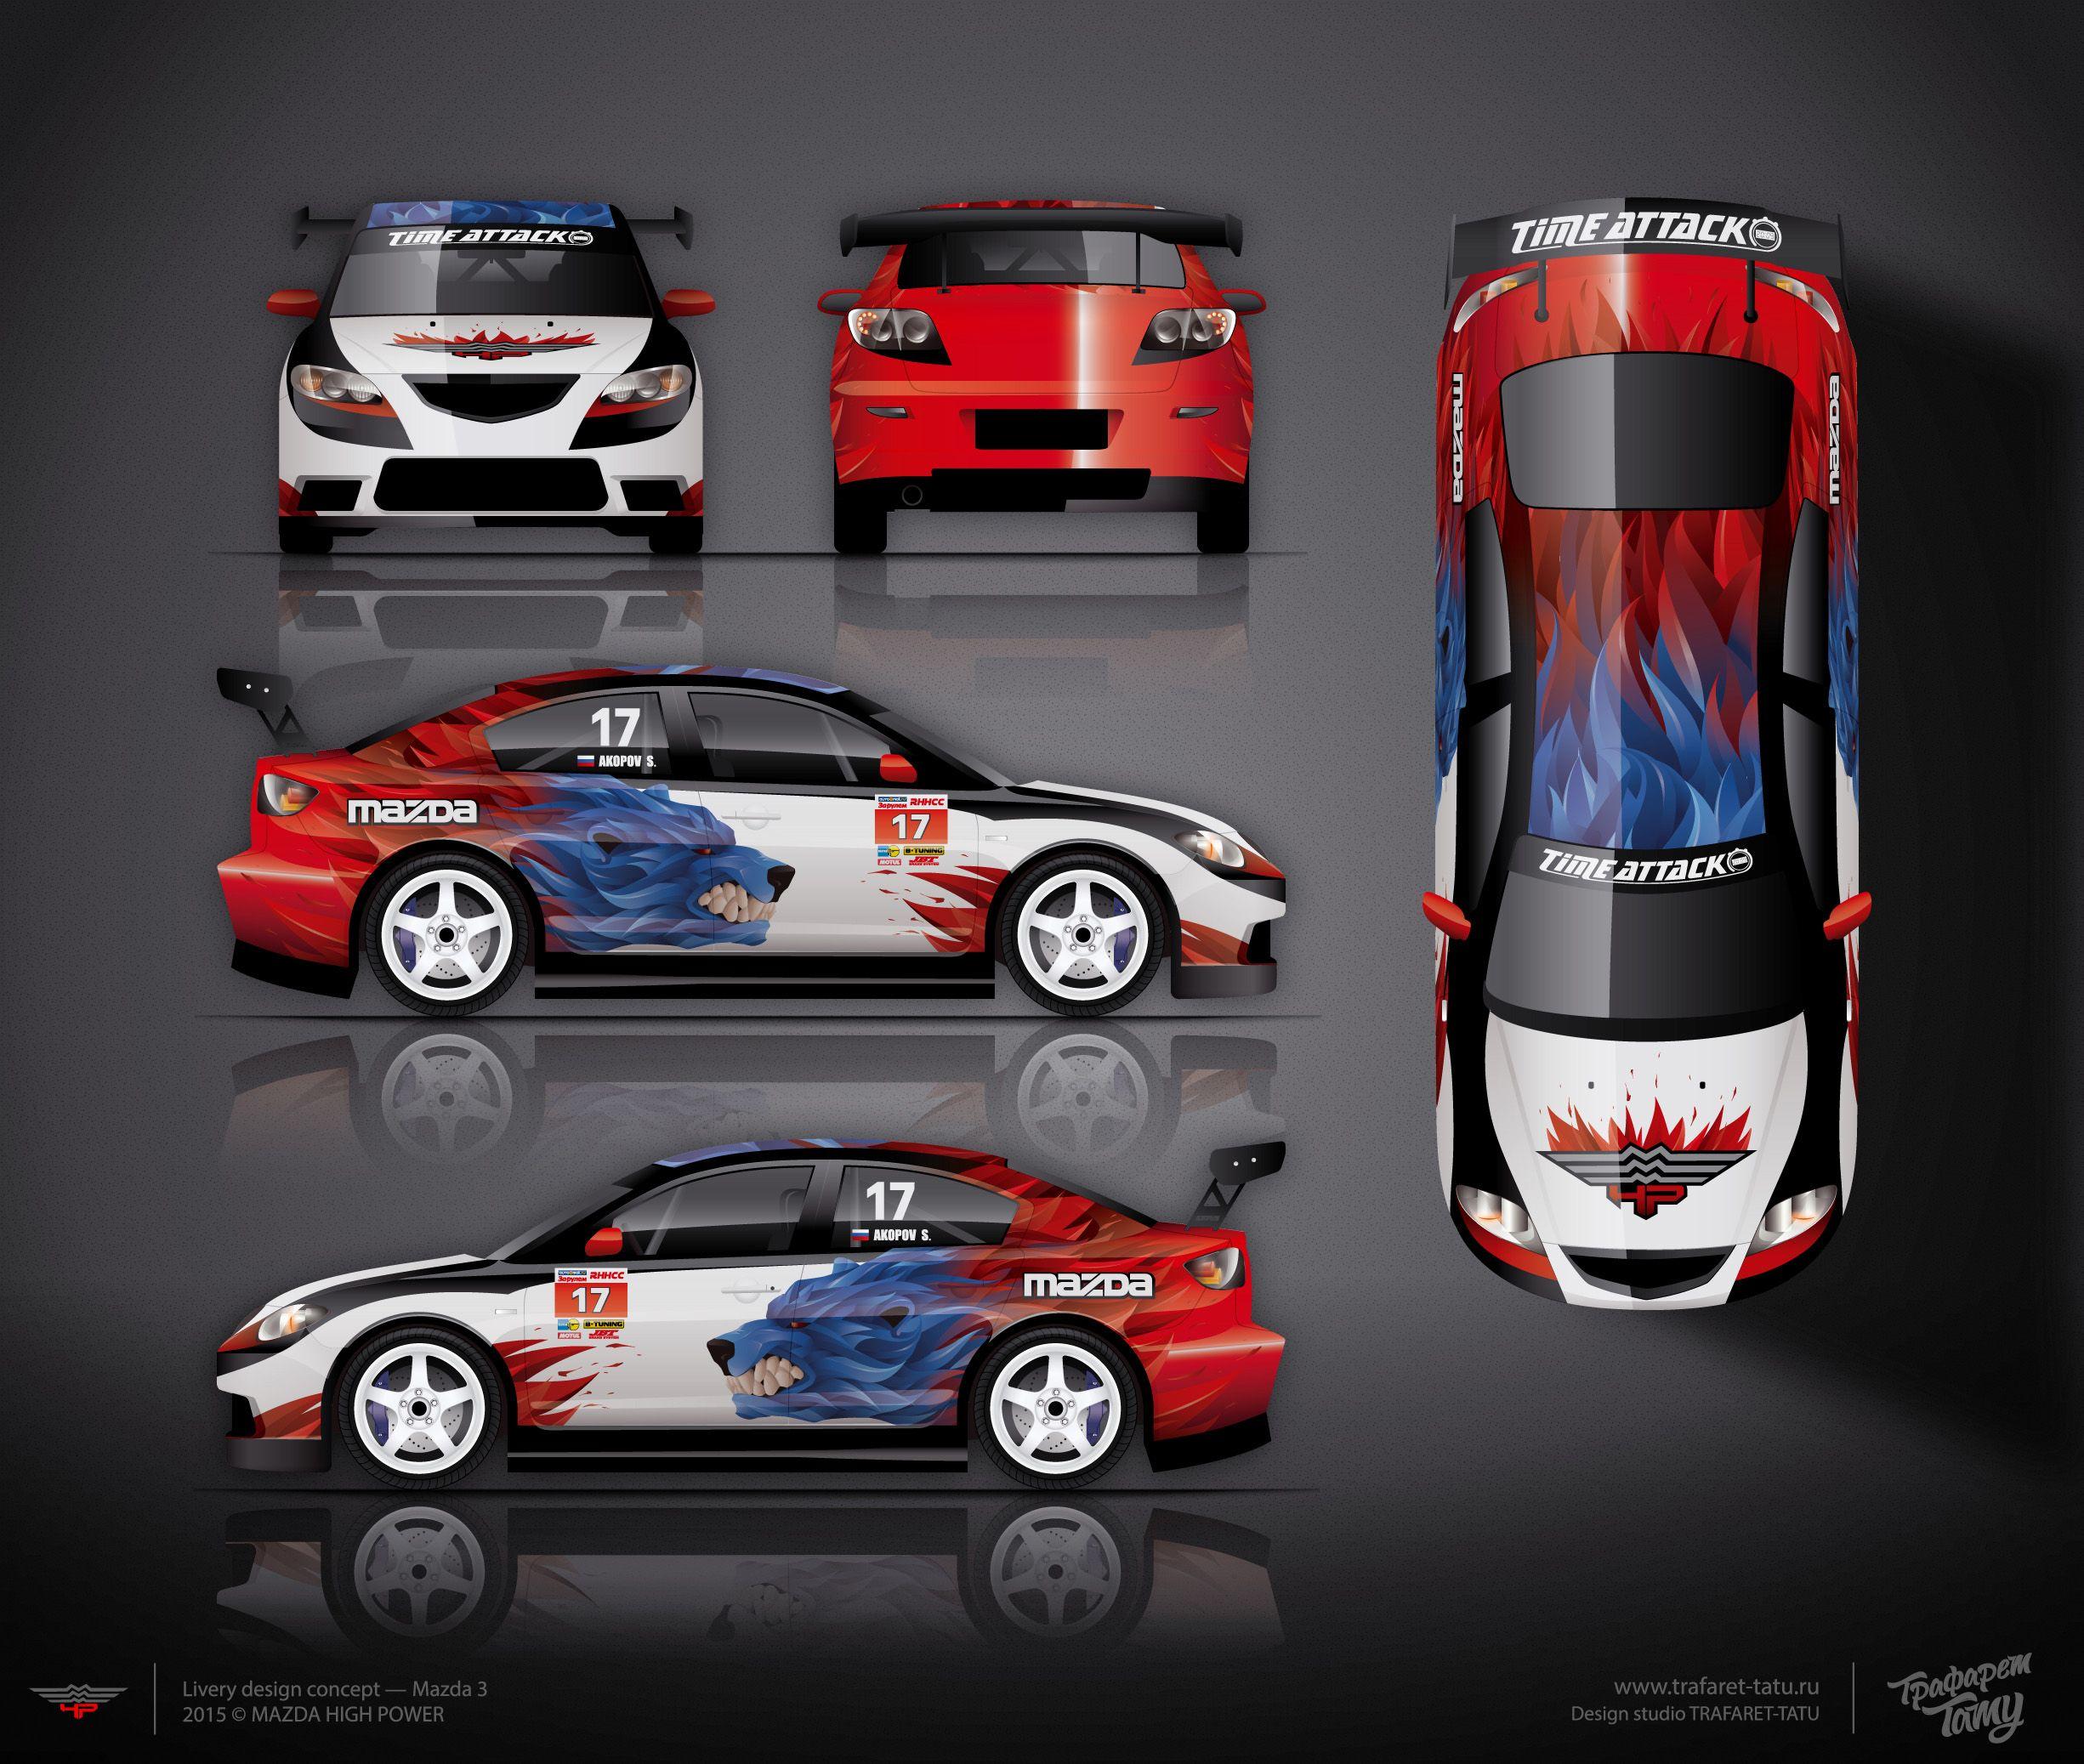 Car design sticker rally - Mazda 3 Approved Livery Design